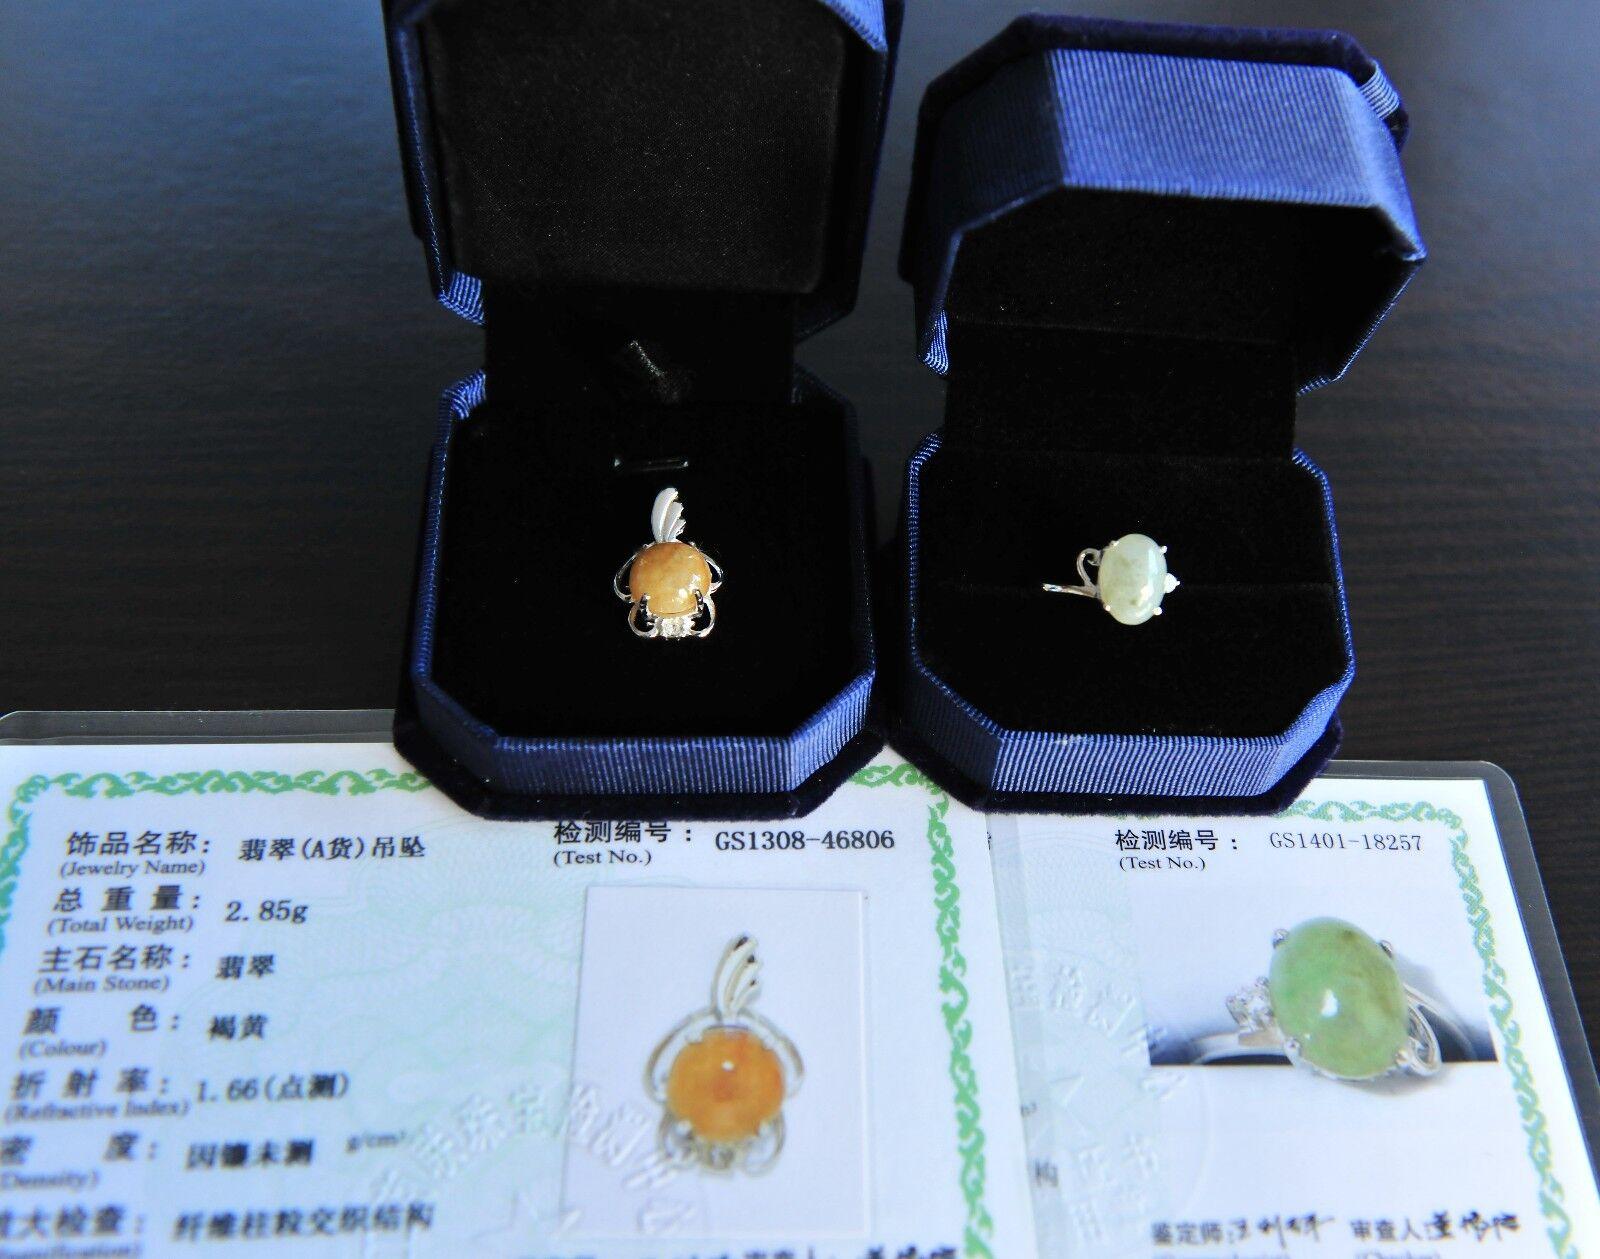 Lot 2 Certified Grade A Jadeite Jade Ring Size 7.75 Yellow Jadeite Pendant